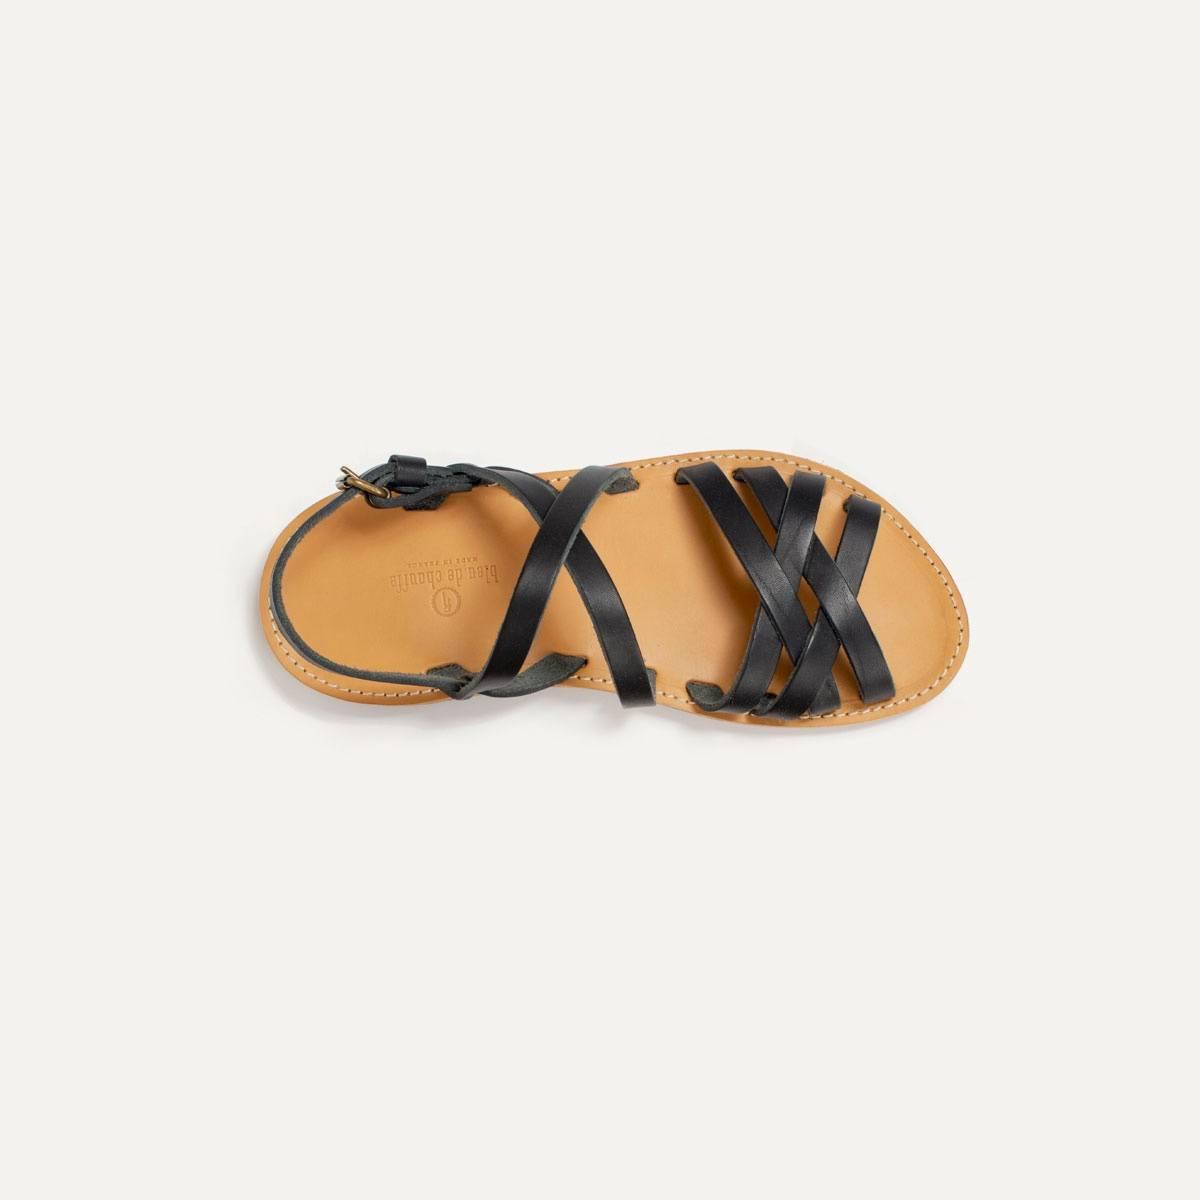 Majour leather sandals - Black (image n°6)